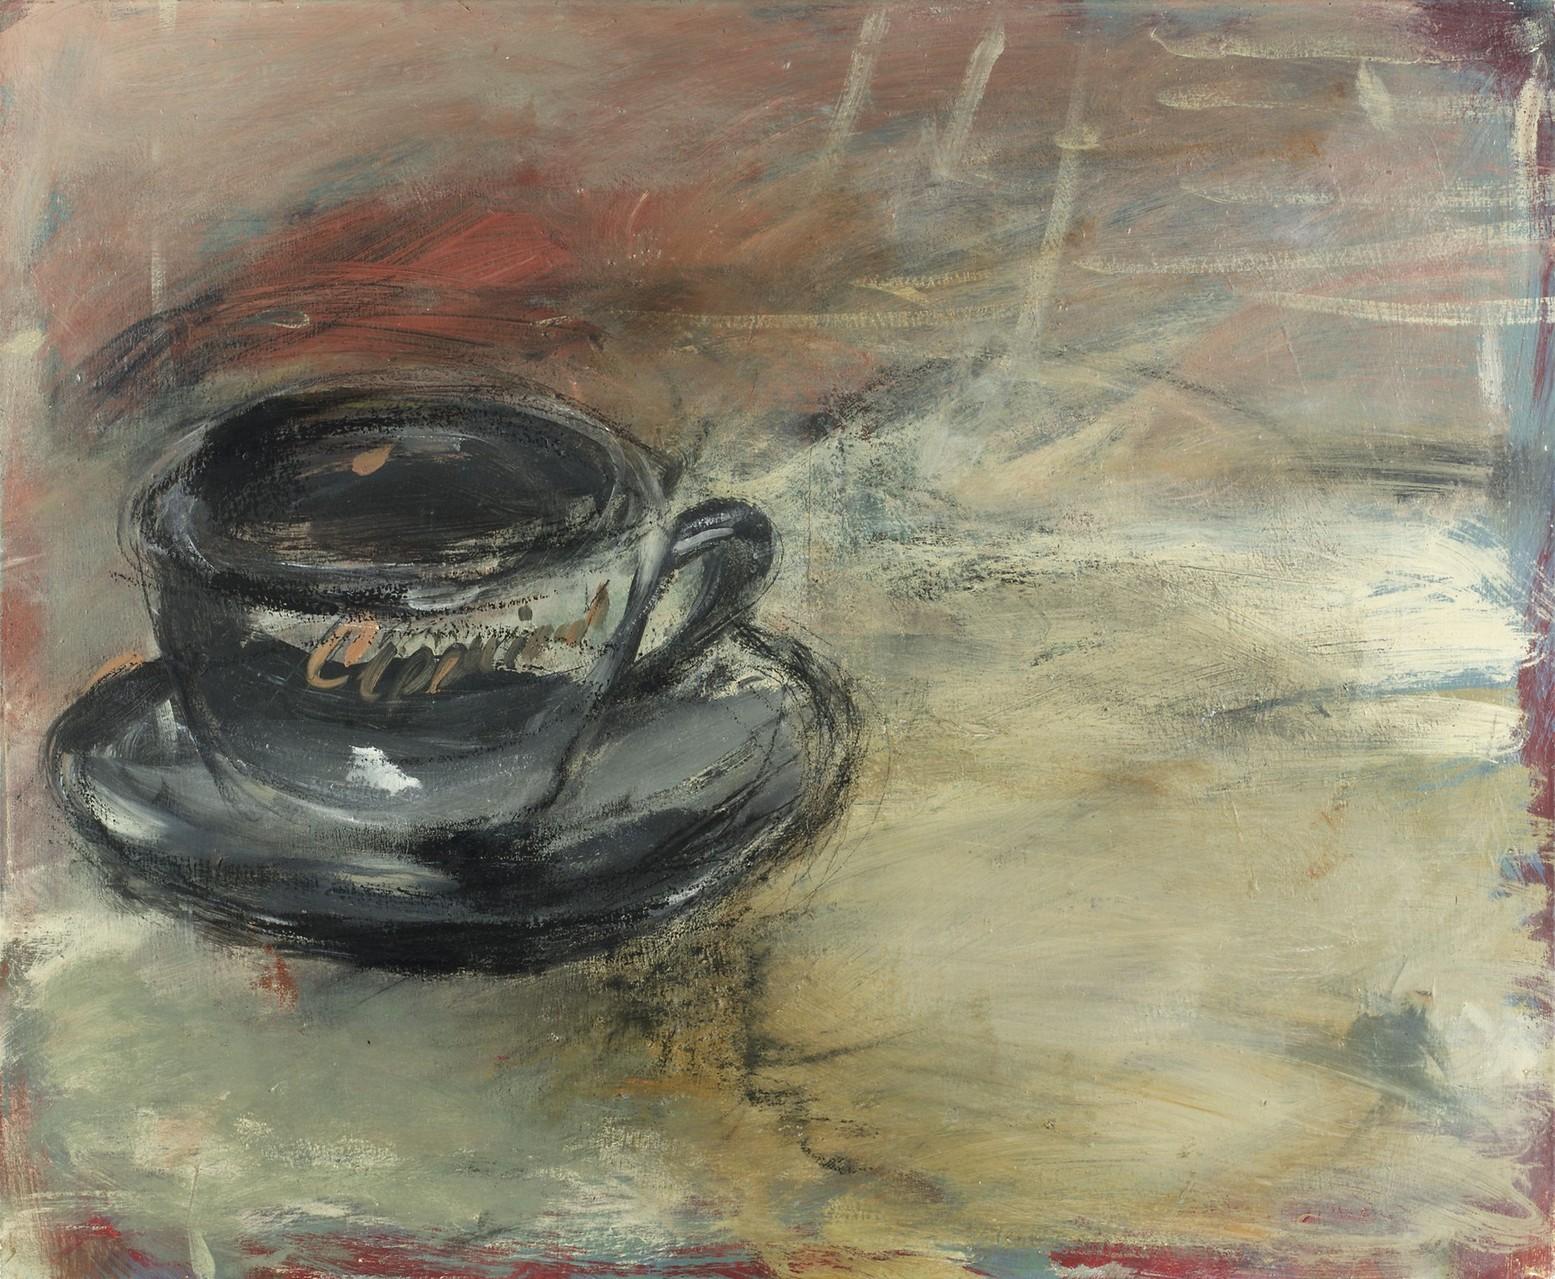 Cappuccino-Tasse | 105 x 120 | 2010